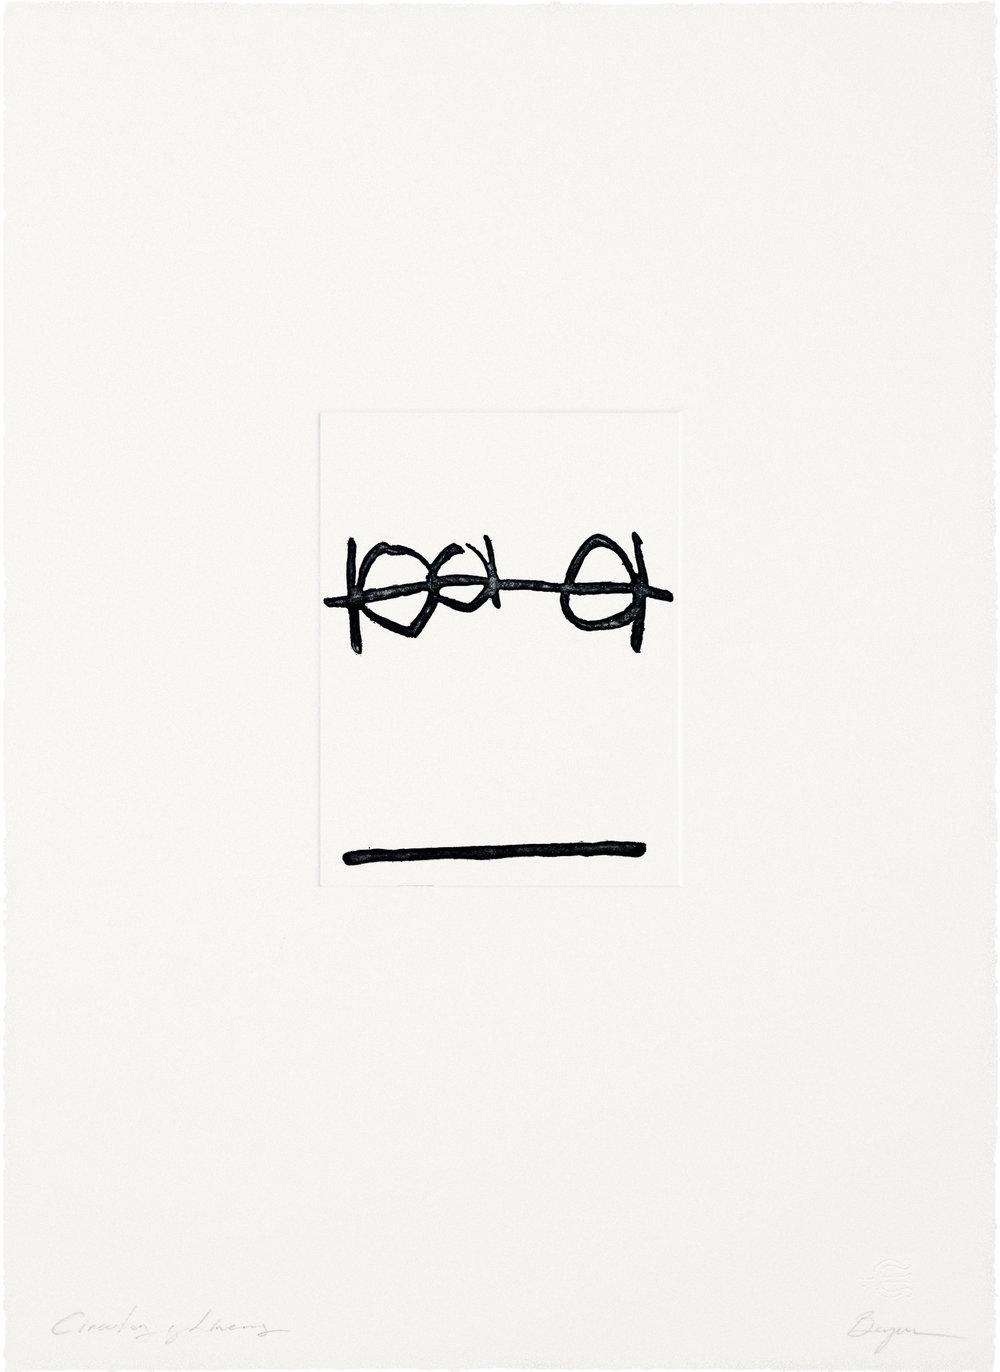 Circles and Lines, Diego Berjon